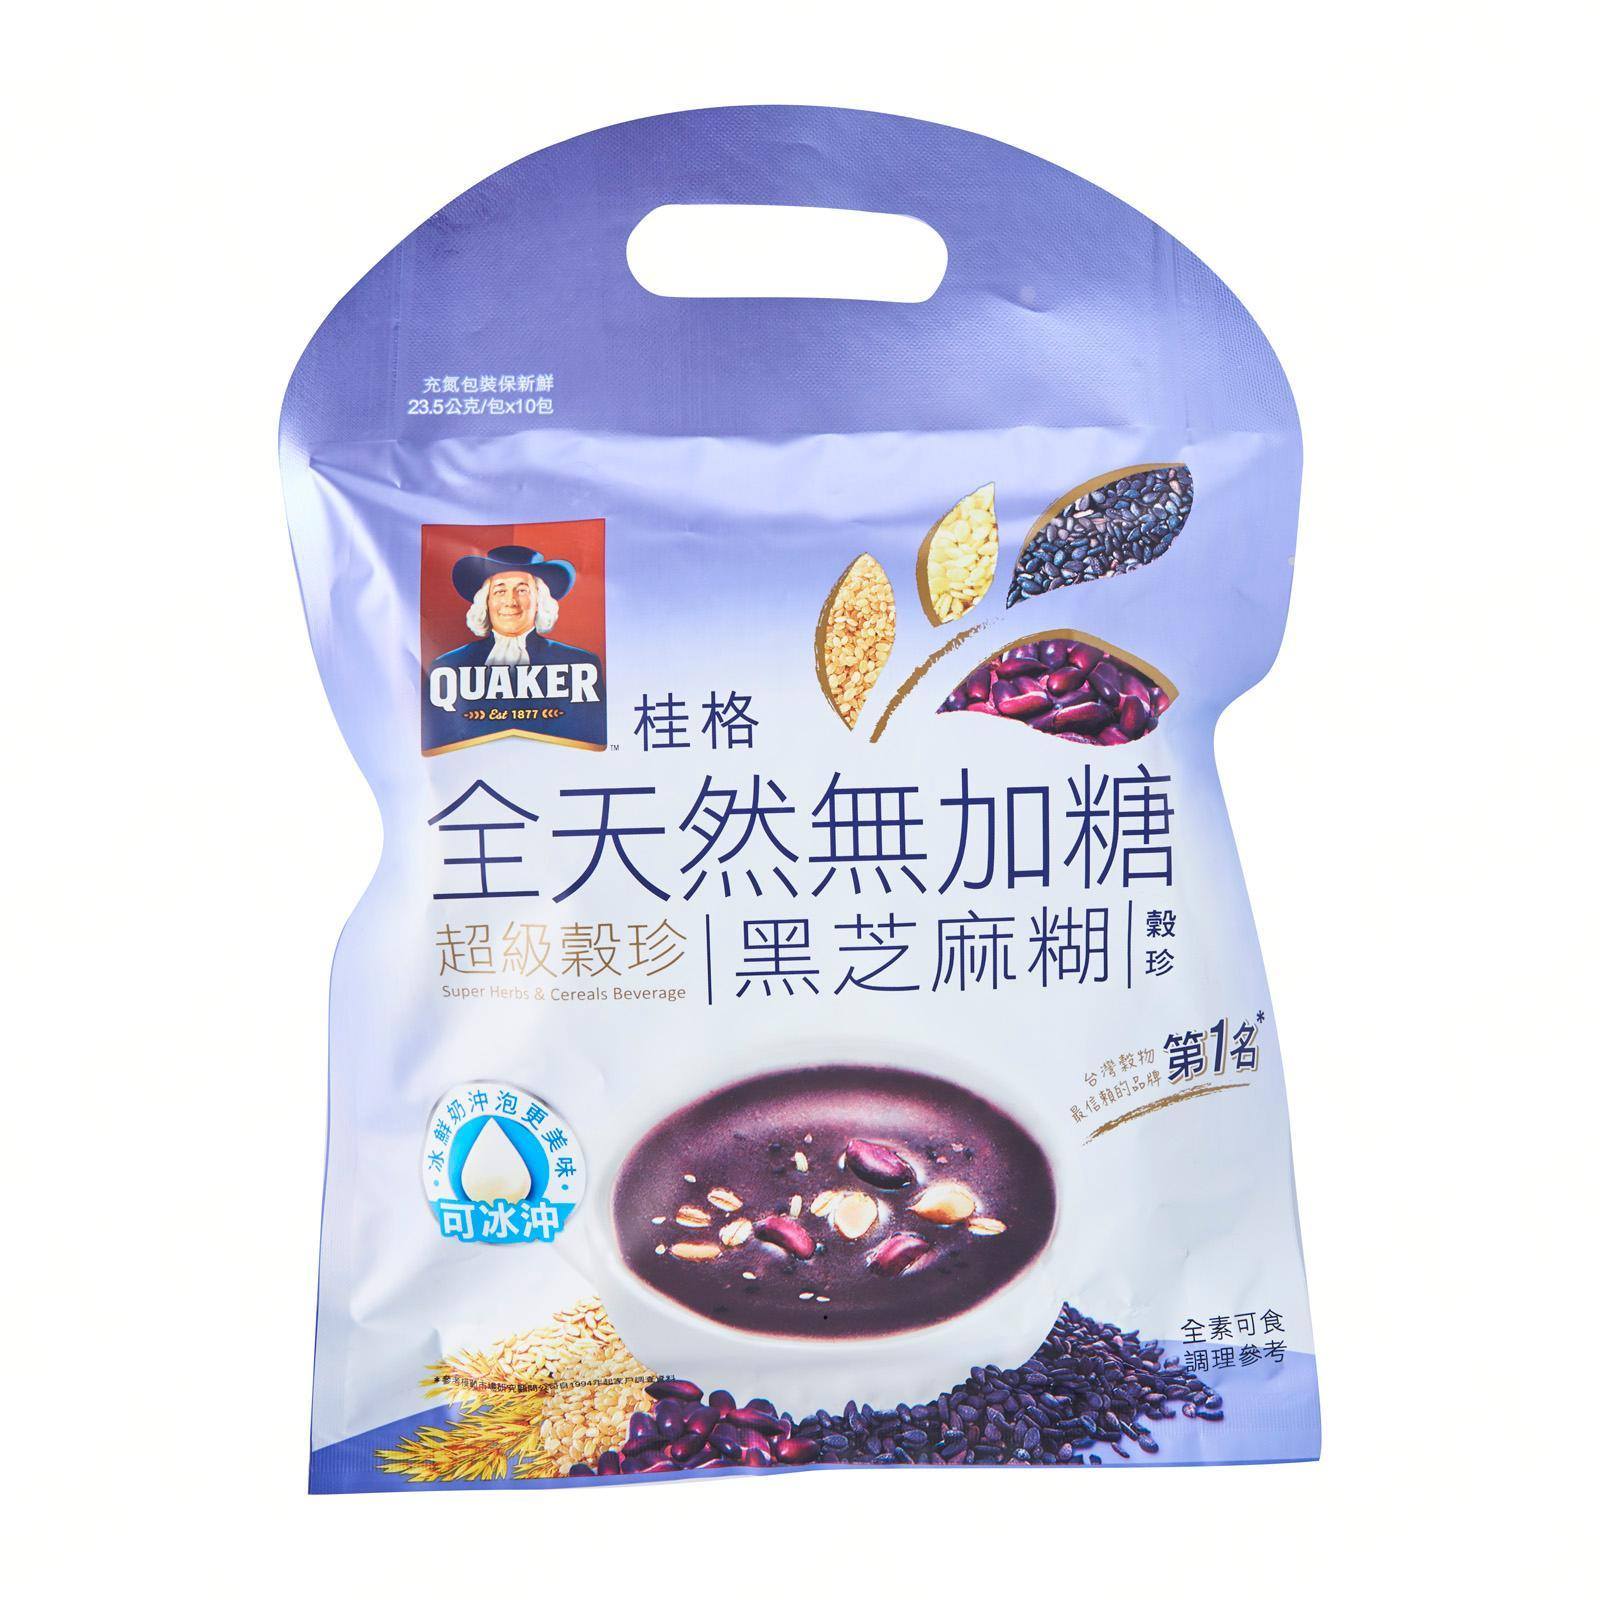 QUAKER Super Herbs and Cereals Beverages No Sugar Sesame Paste